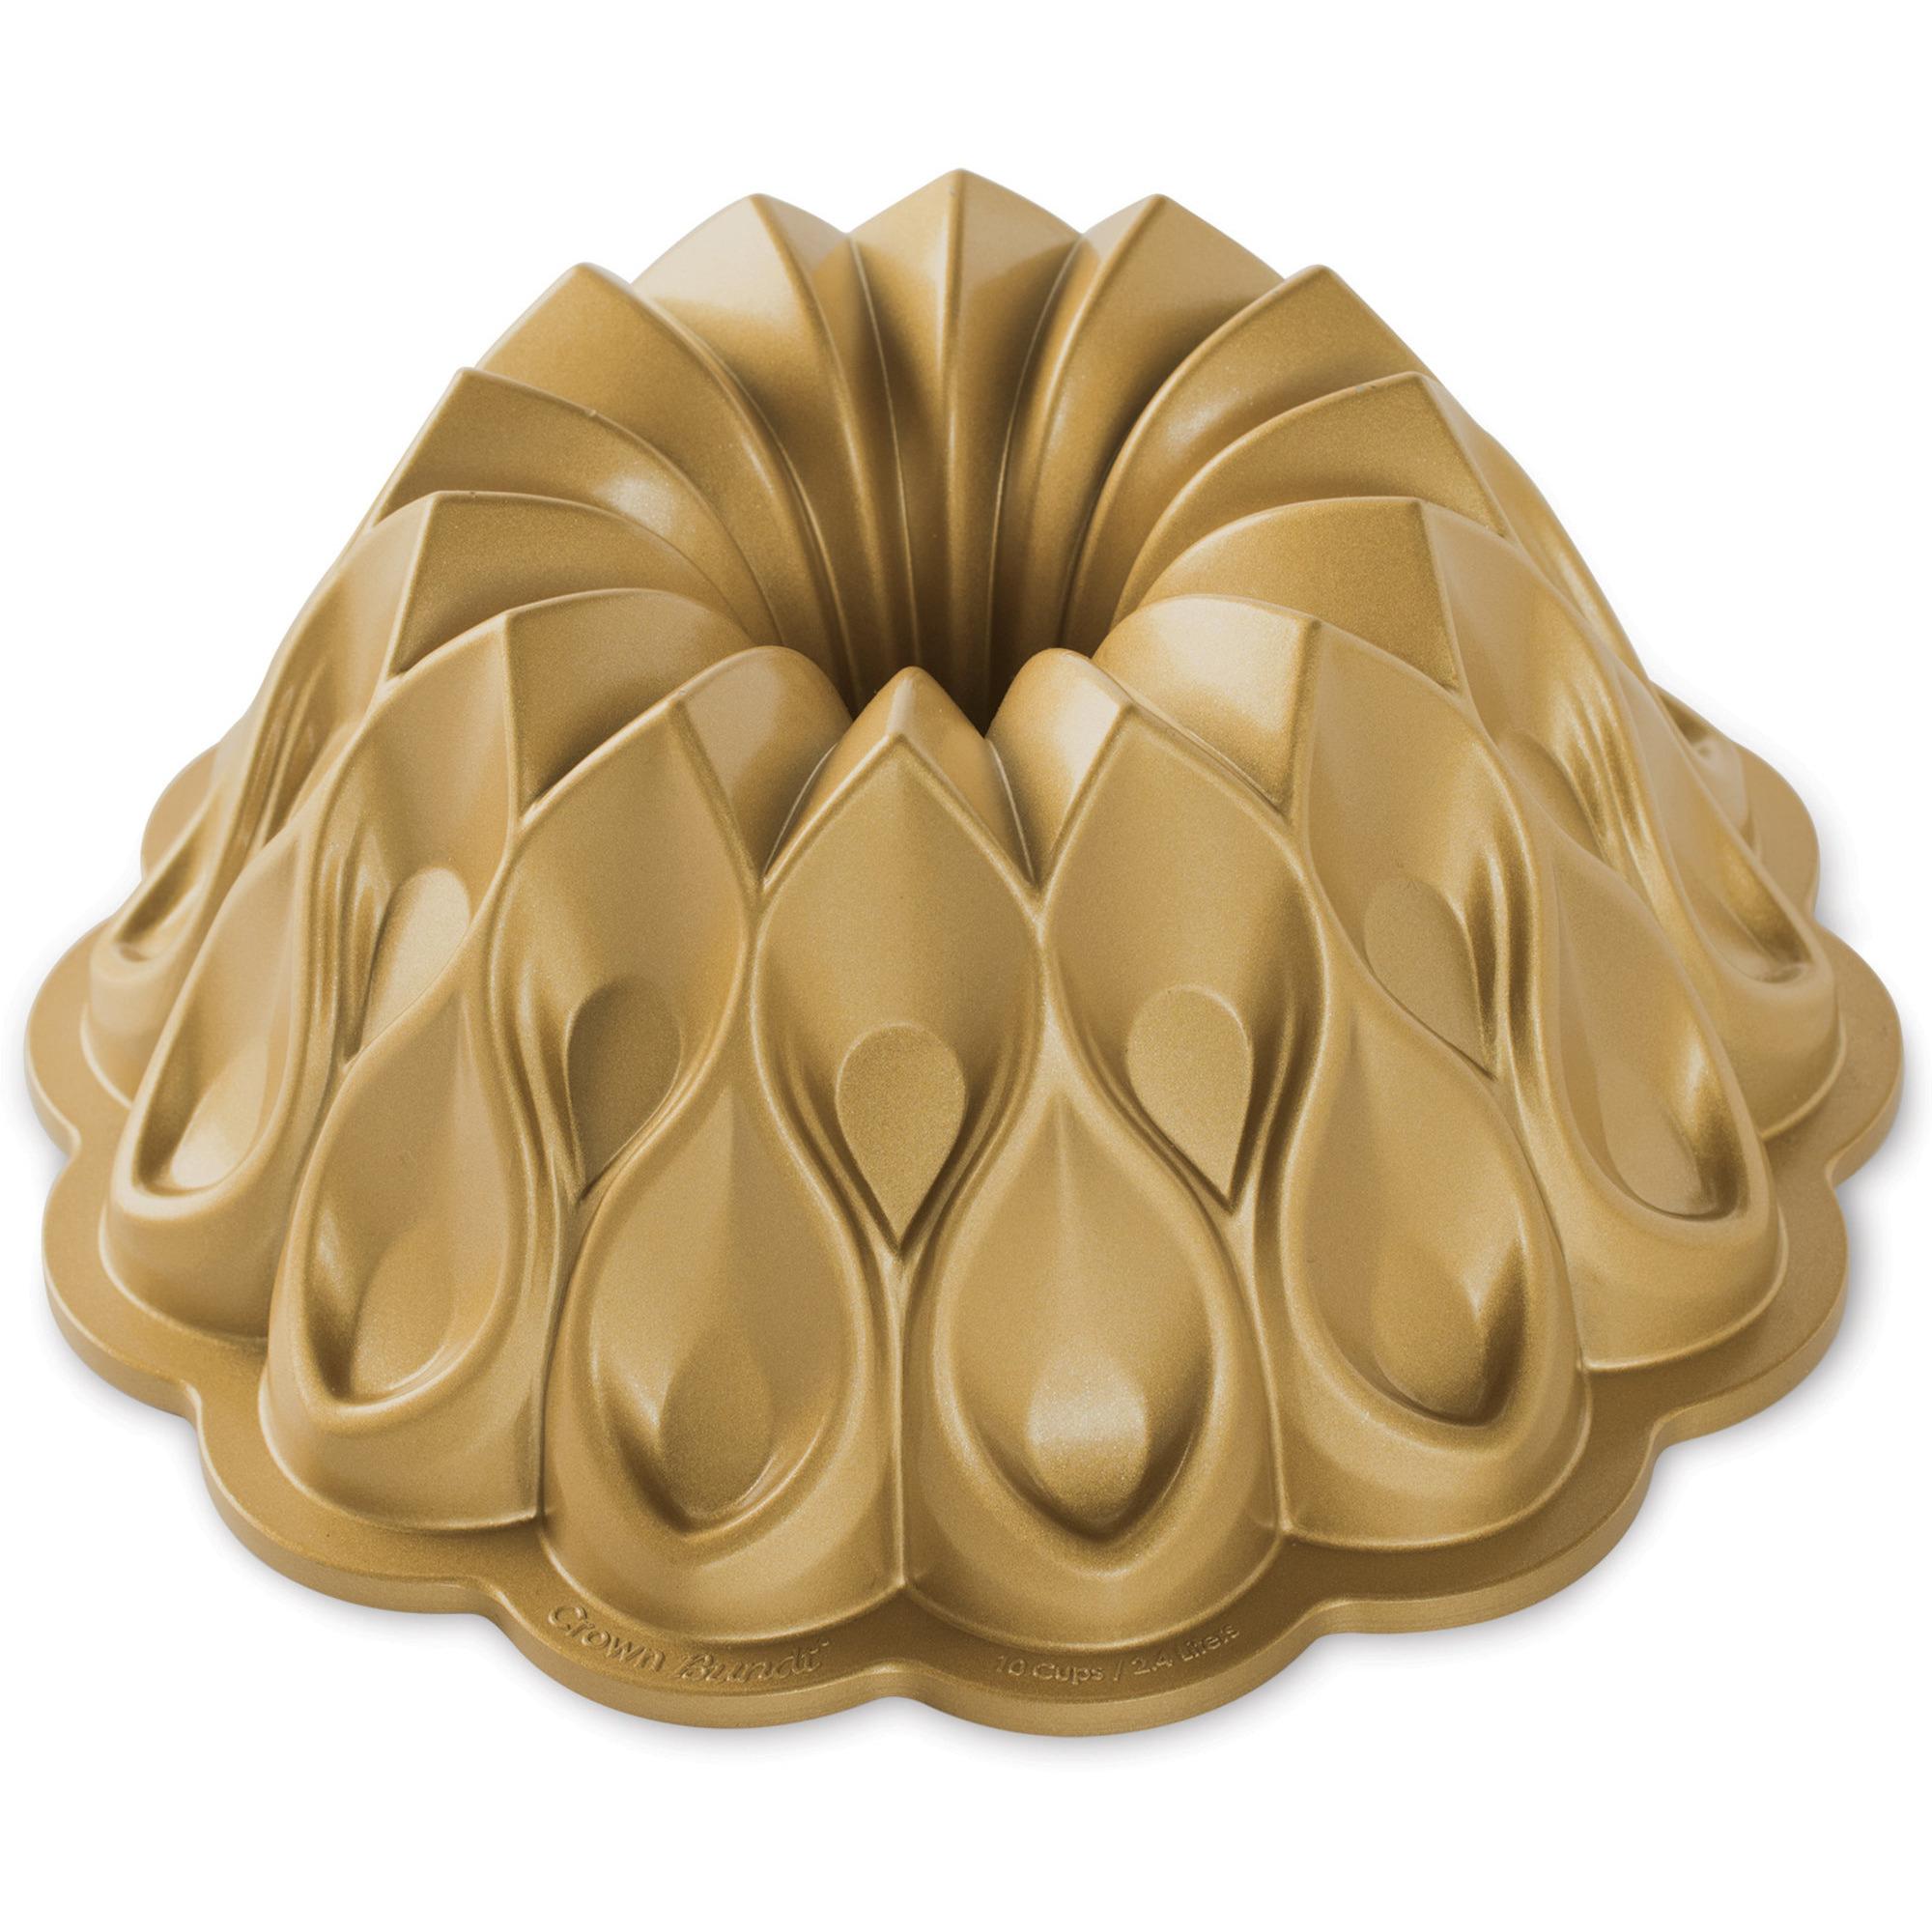 Nordic Ware Bakform Krona 70th Anniversary Gold